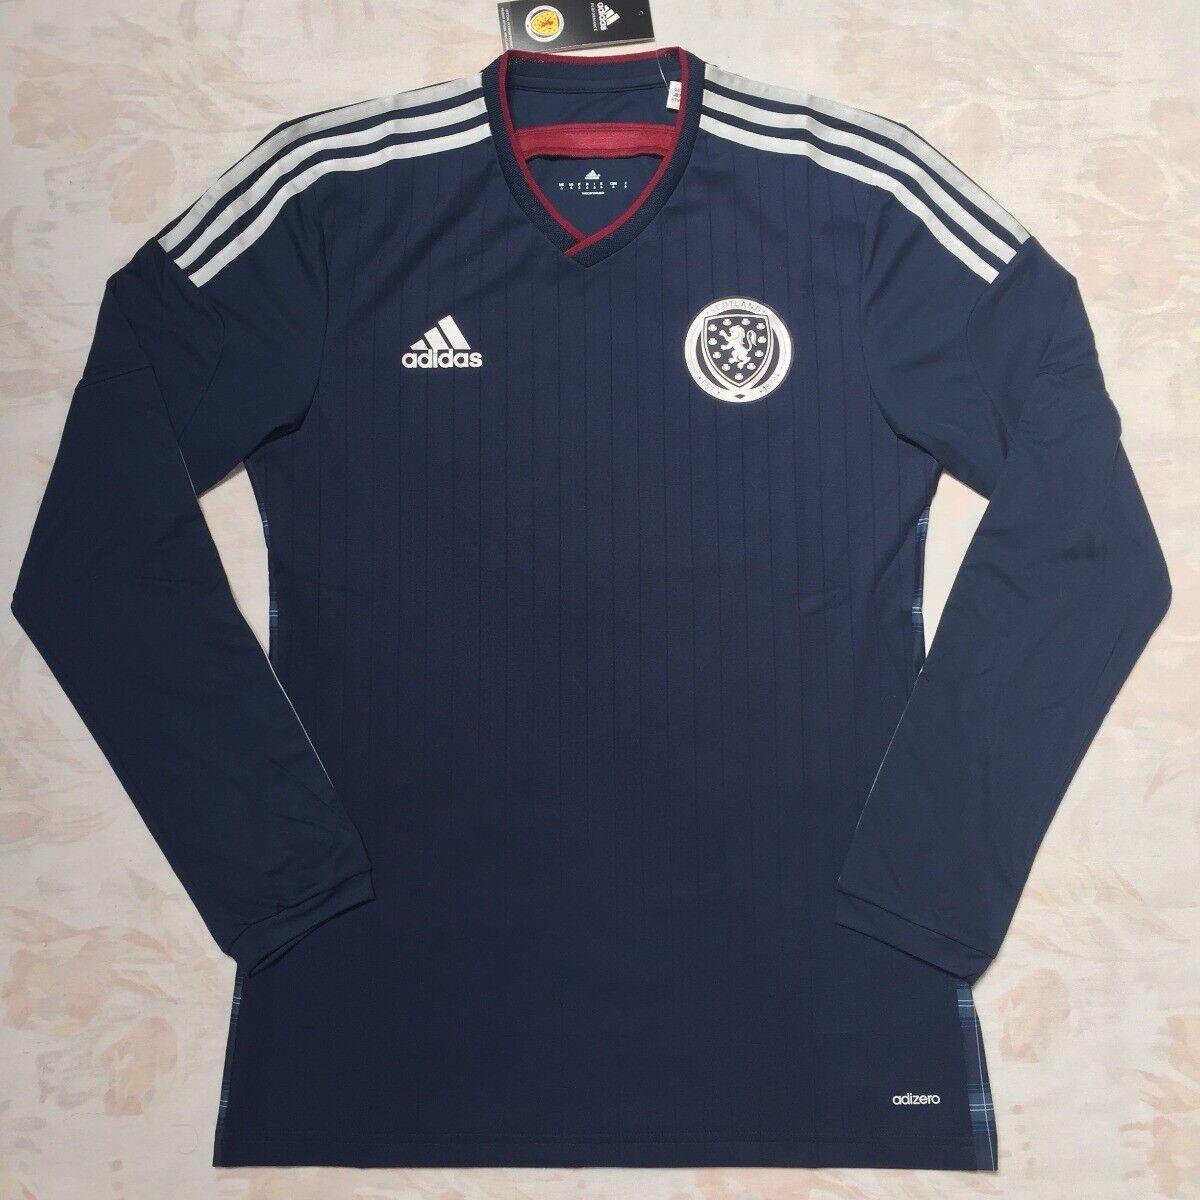 Authentic Adidas Scotland Adizero Player Issue Long Sleeve shirt - Bnwt Small